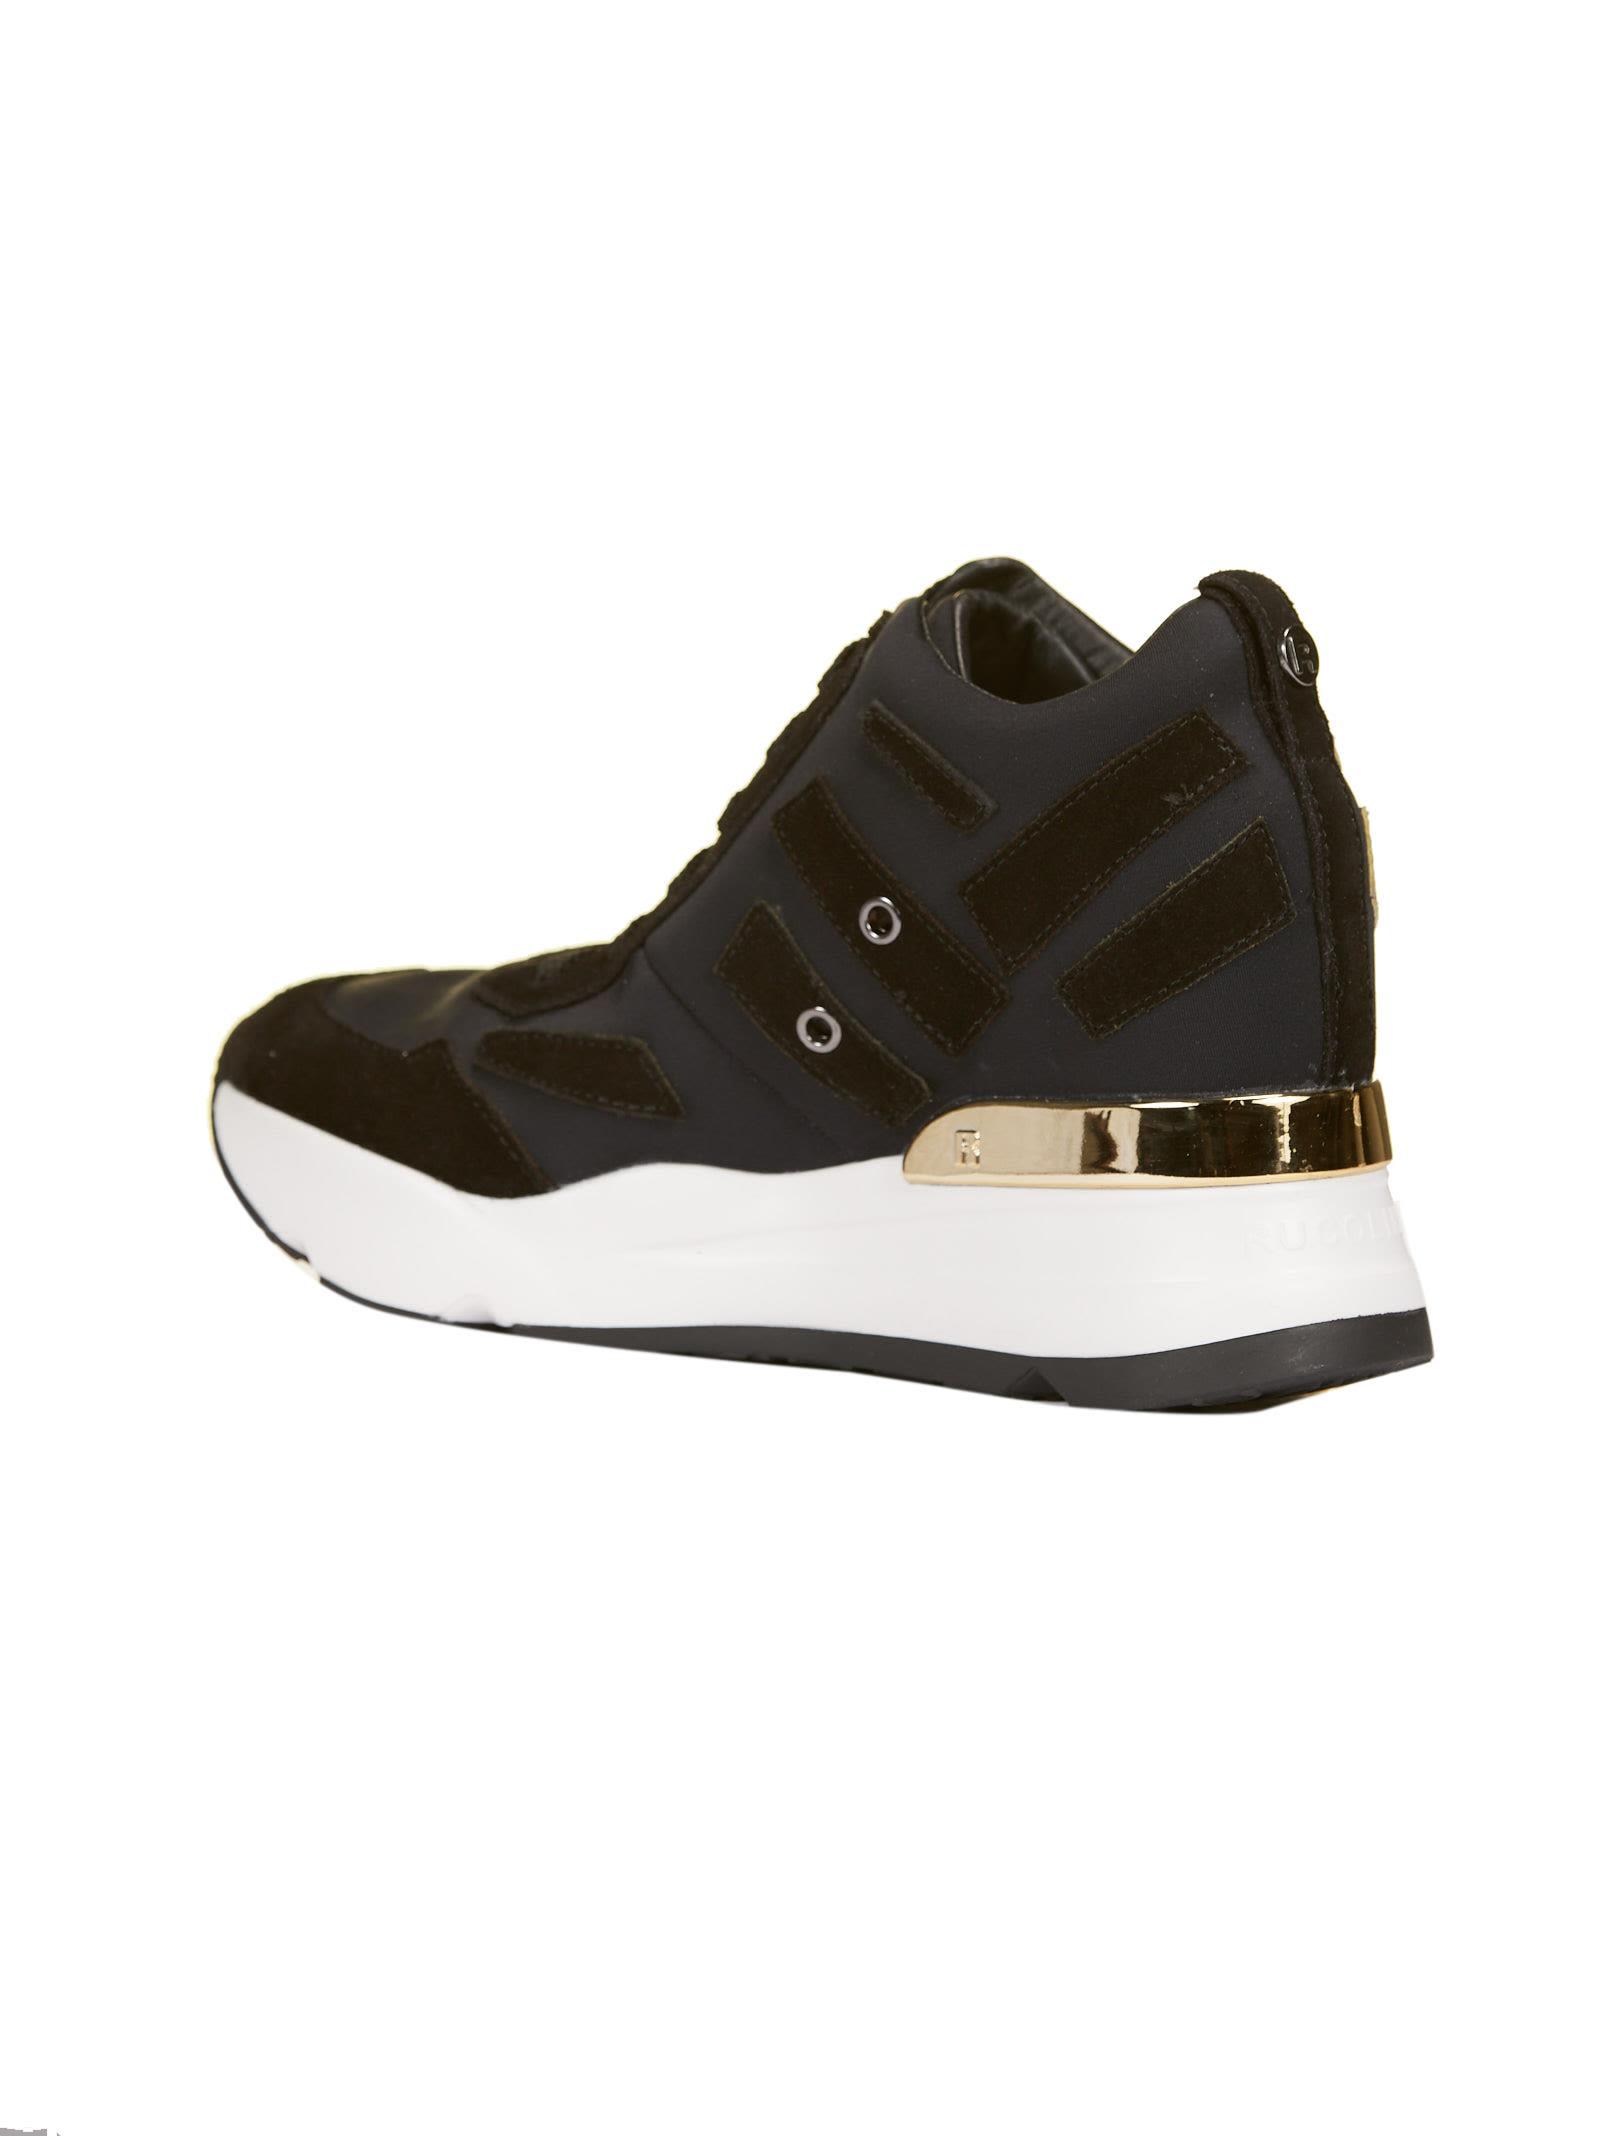 platform sneakers - Black Ruco Line pDJqEKW6t5